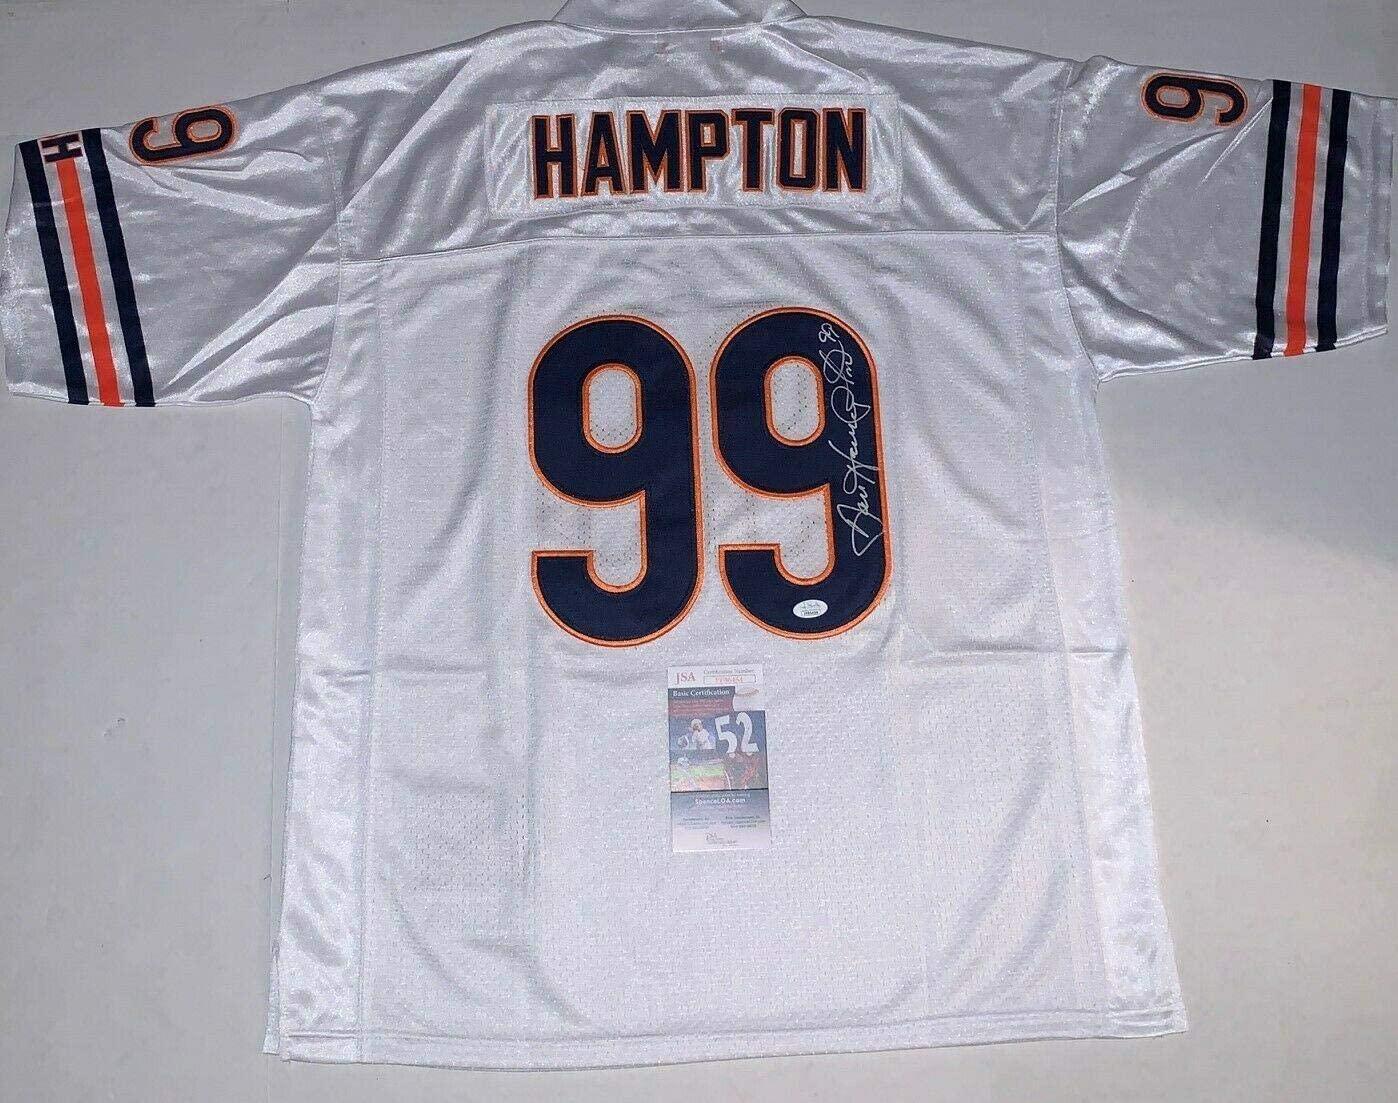 Dan Hampton Autographed Jersey - HOF - JSA Certified - Autographed NFL Jerseys